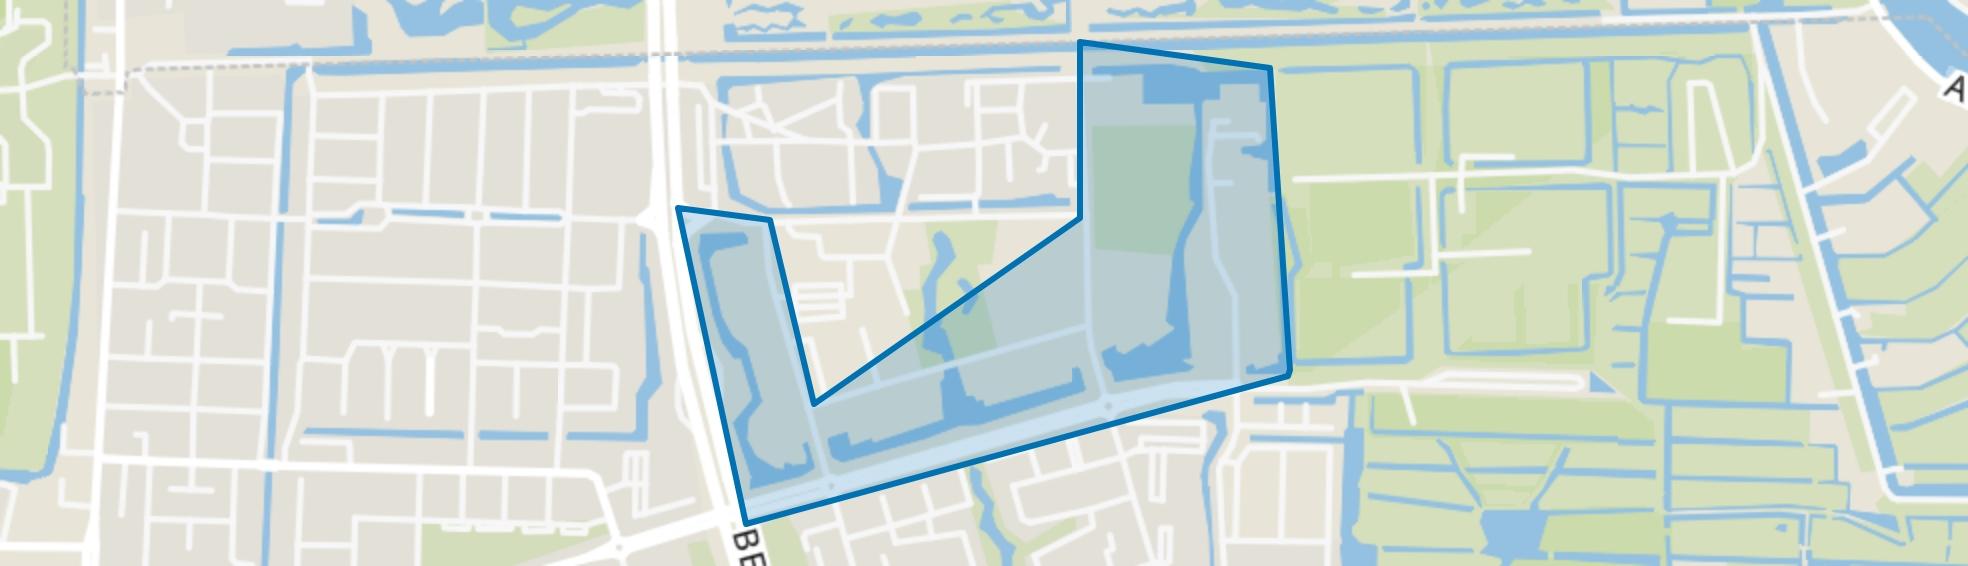 Kronenburg, Amstelveen map